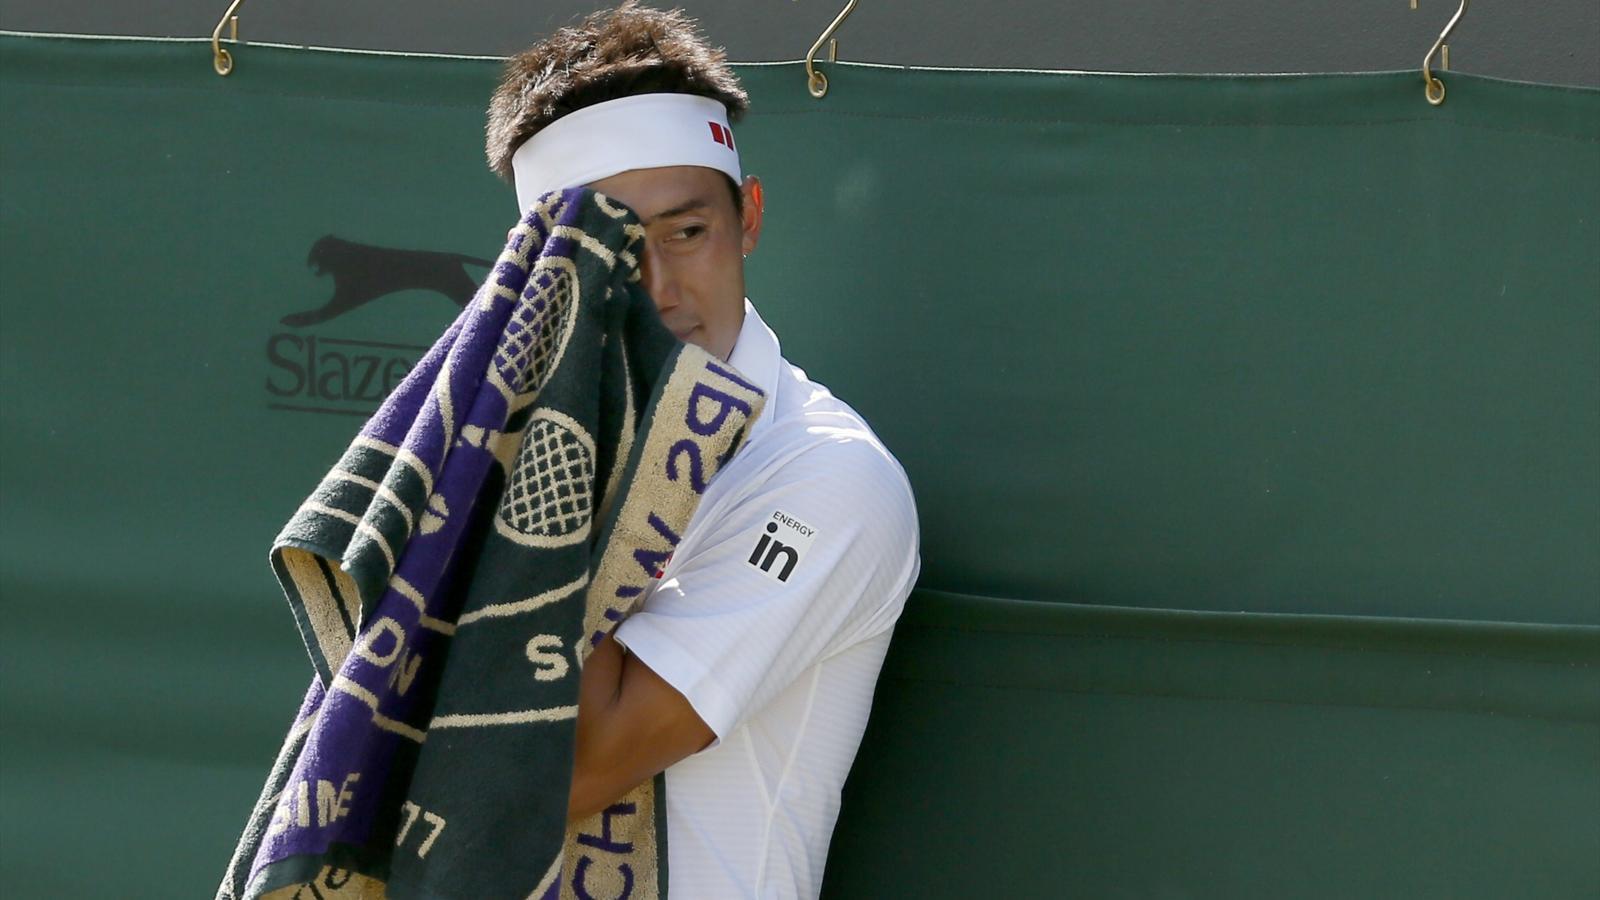 Kei Nishikori of Japan wipes his face during his men's singles tennis match against Milos Raonic